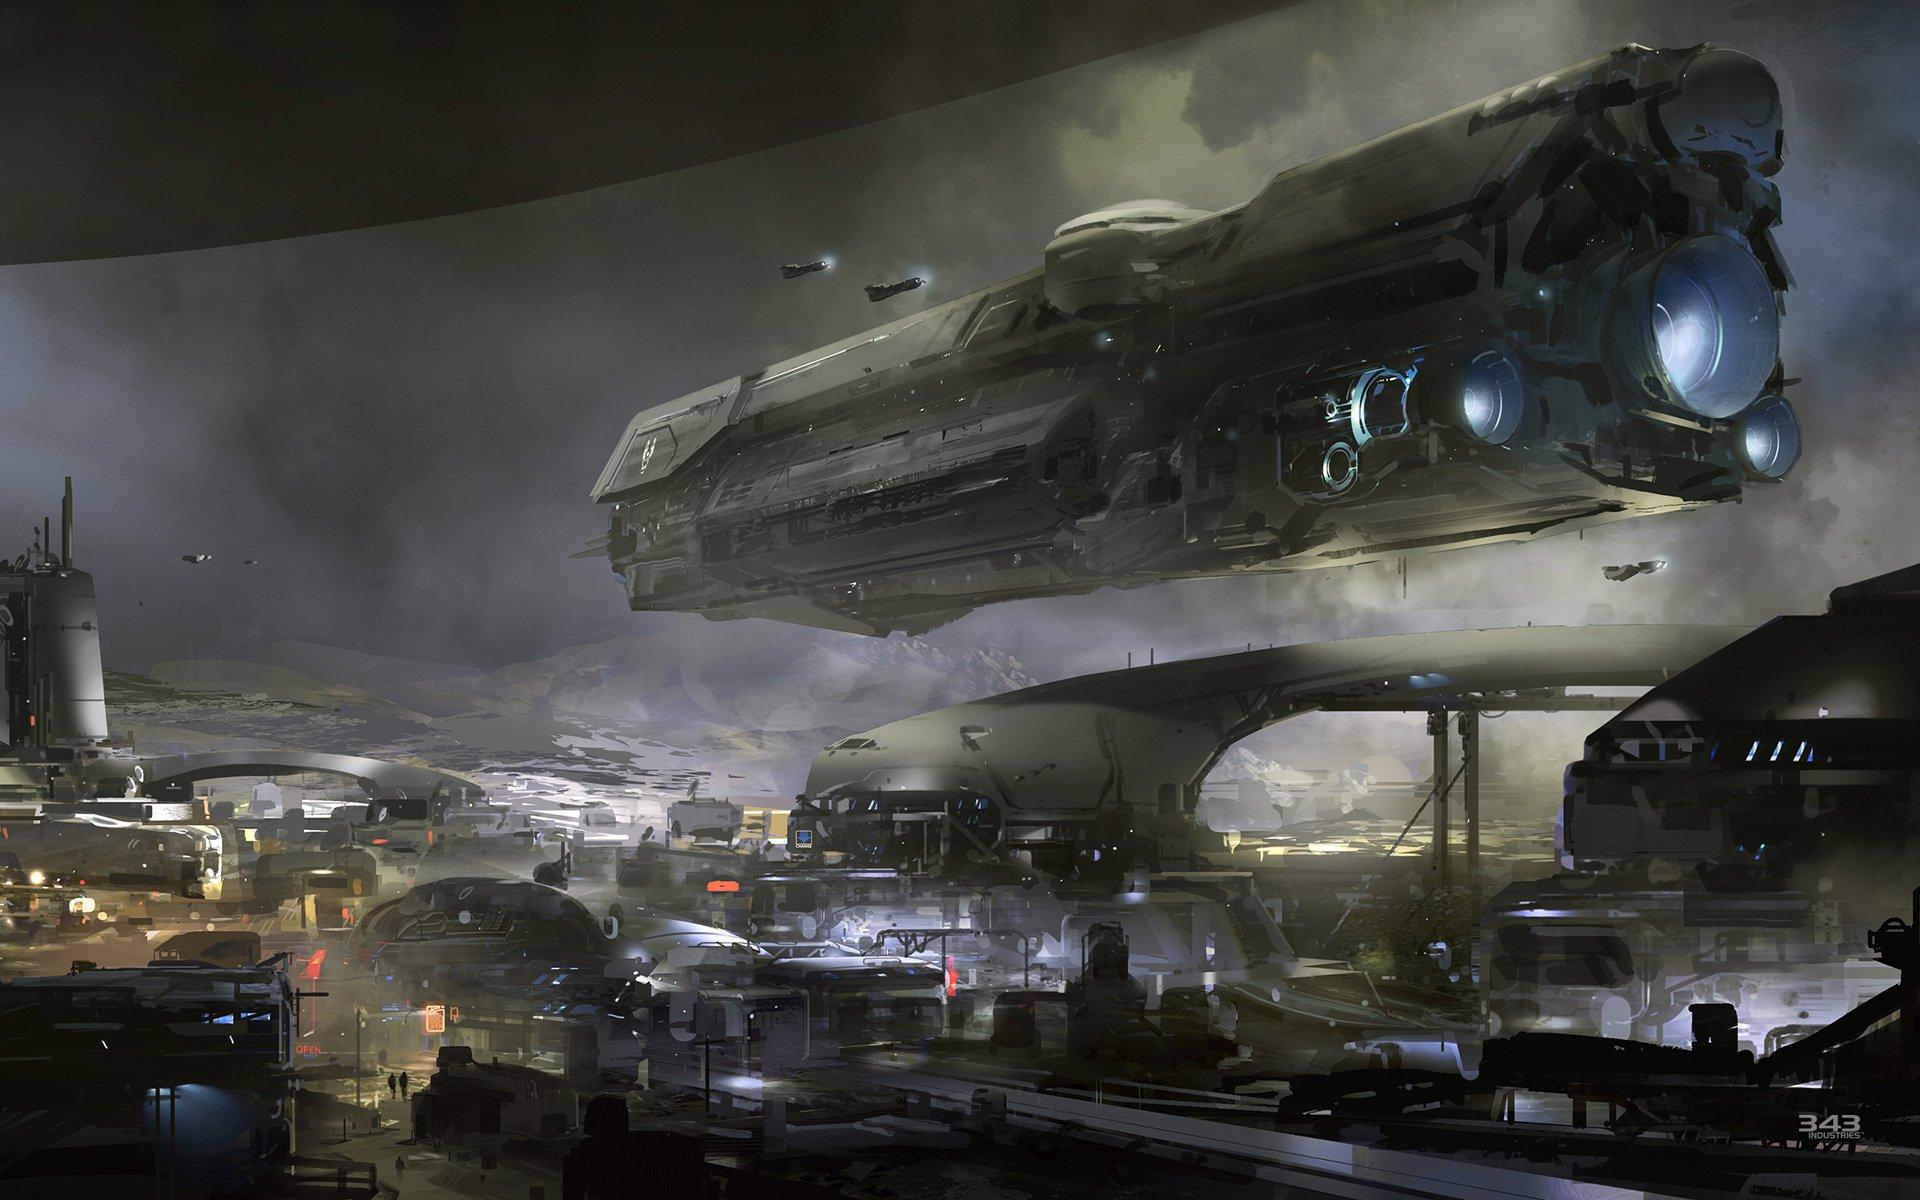 Halo 5 guardians full hd wallpaper and hintergrund - Halo 5 screensaver ...